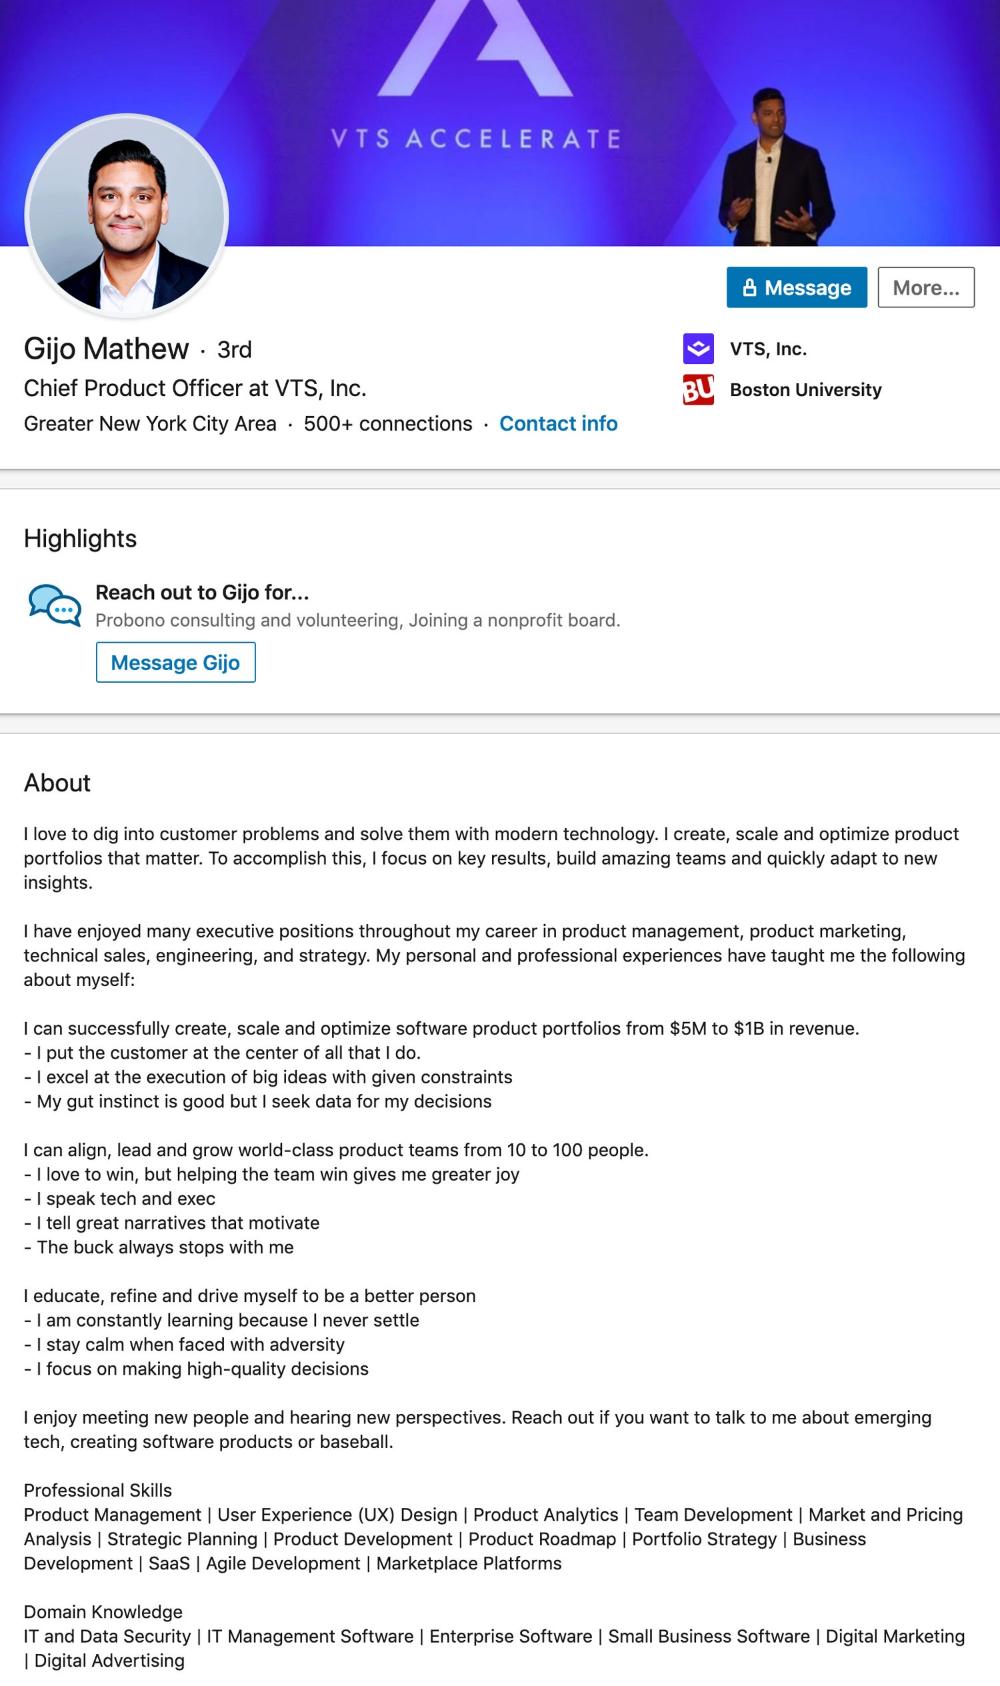 Linkedin View Uploaded Resume